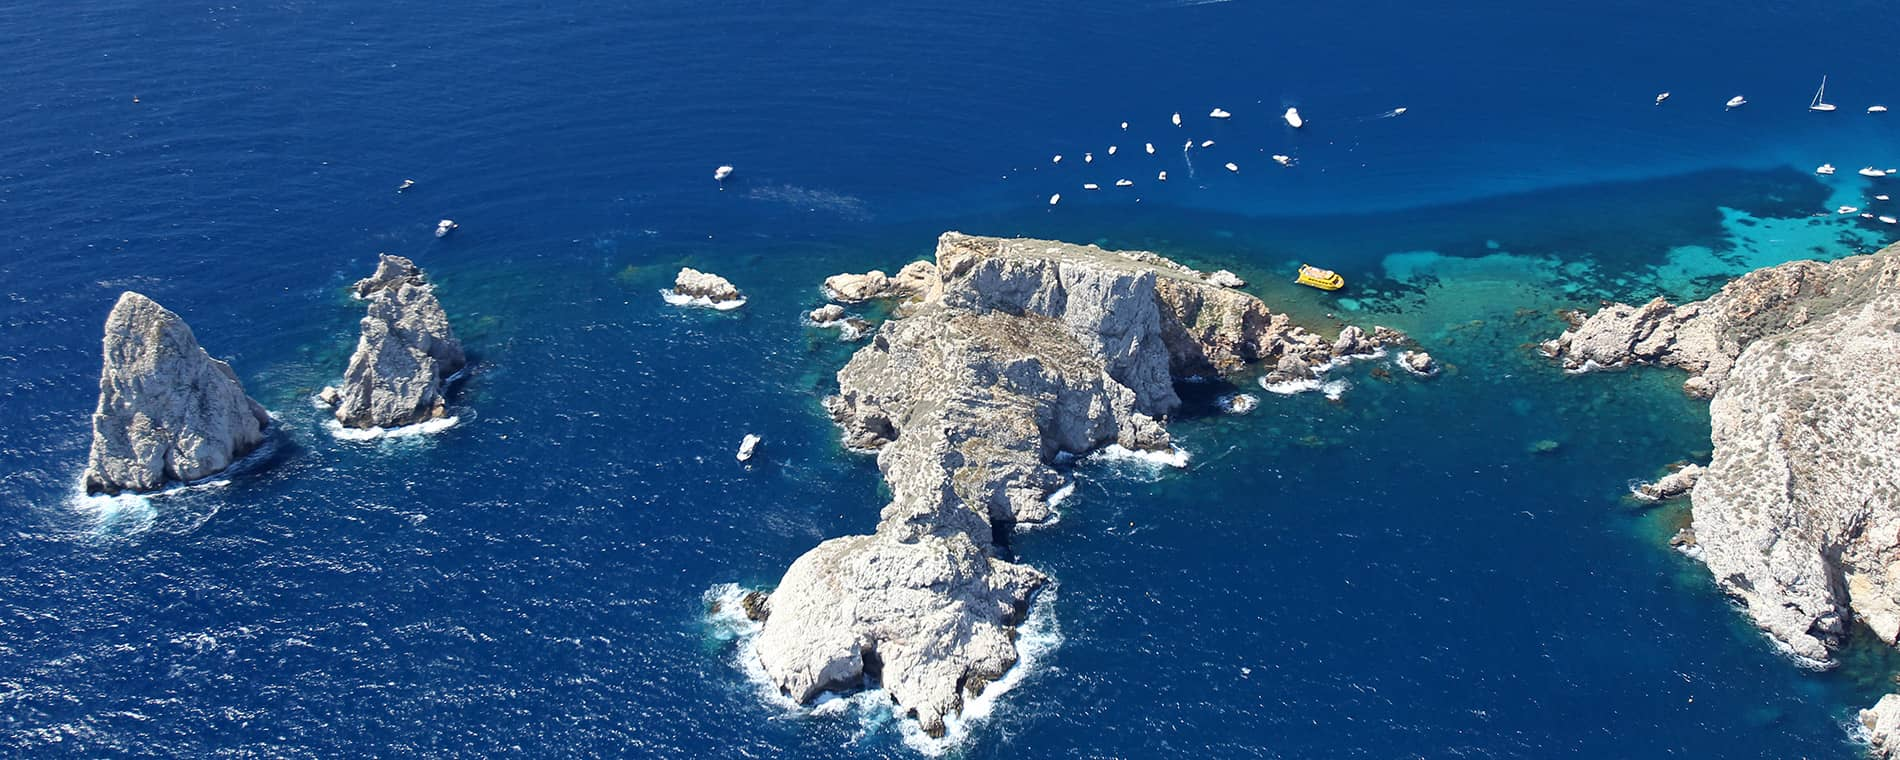 11.-18.5.2019 Španělsko Illes Medes